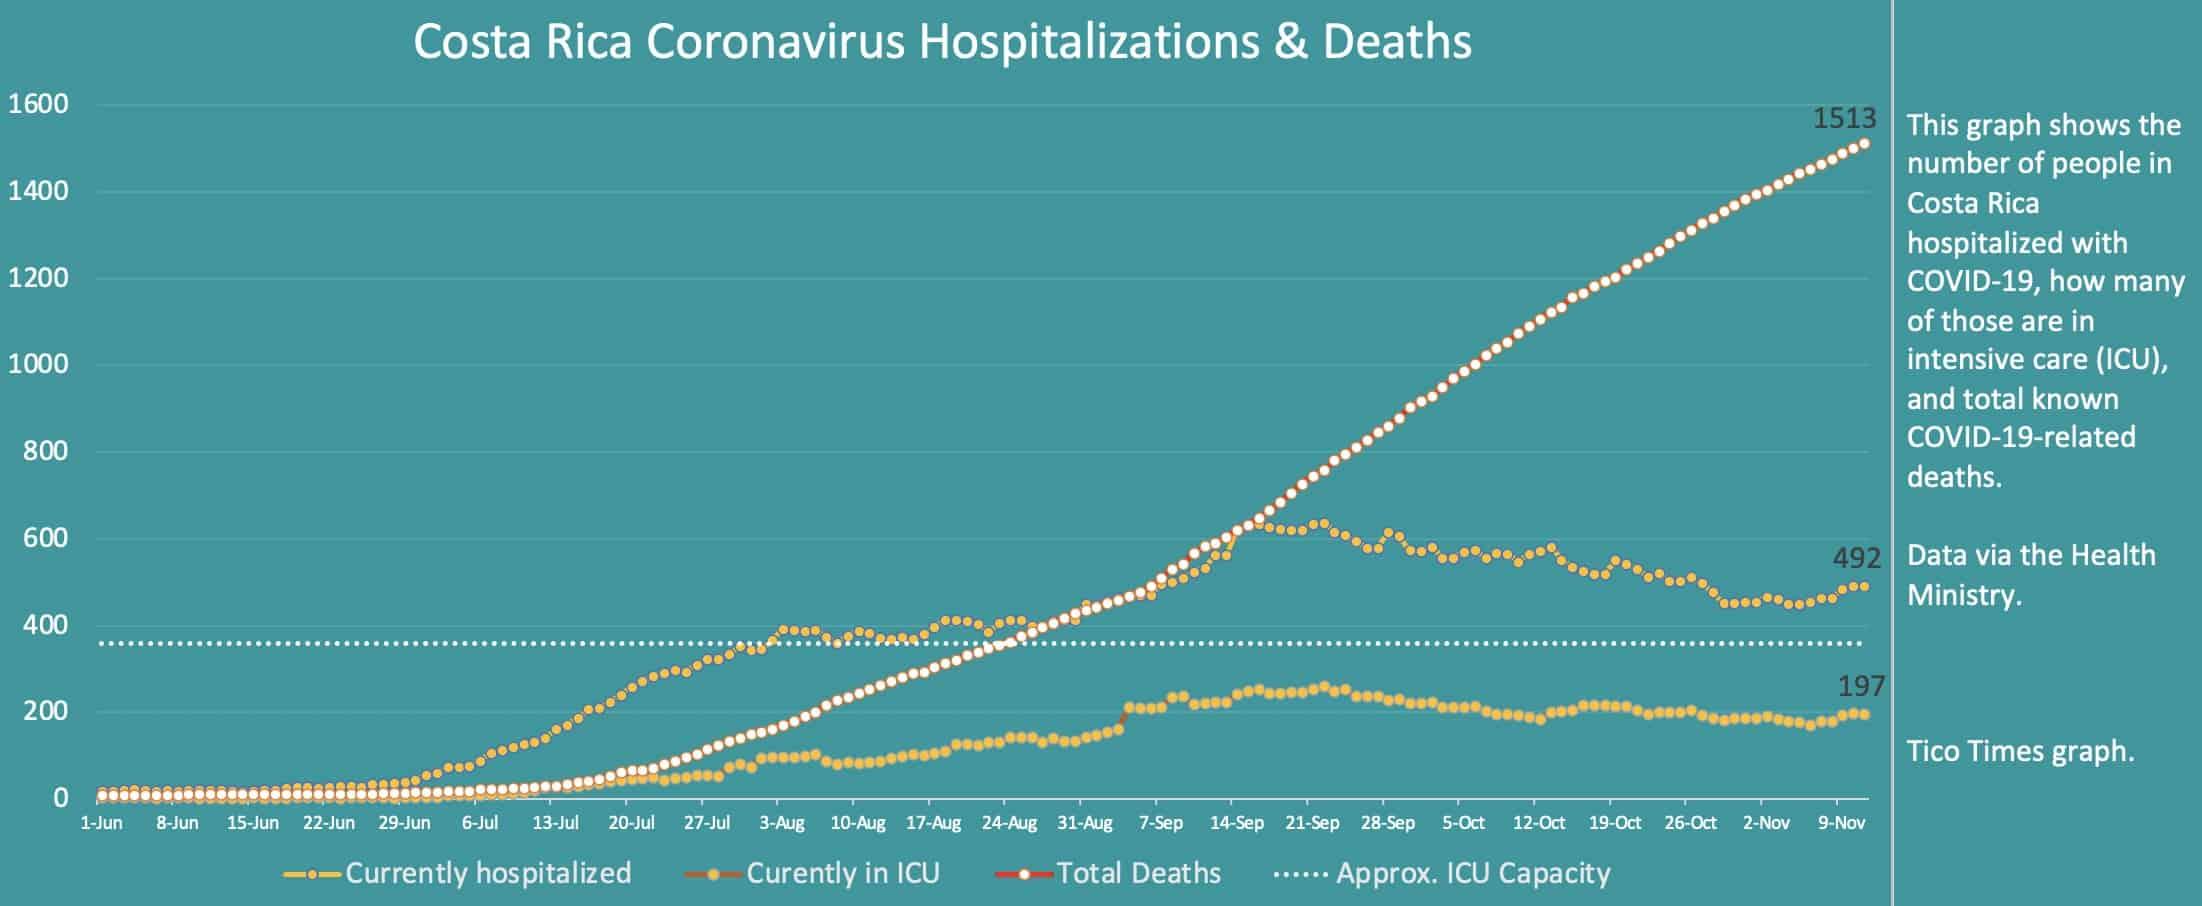 Costa Rica coronavirus hospitalizations and deaths on November 11, 2020